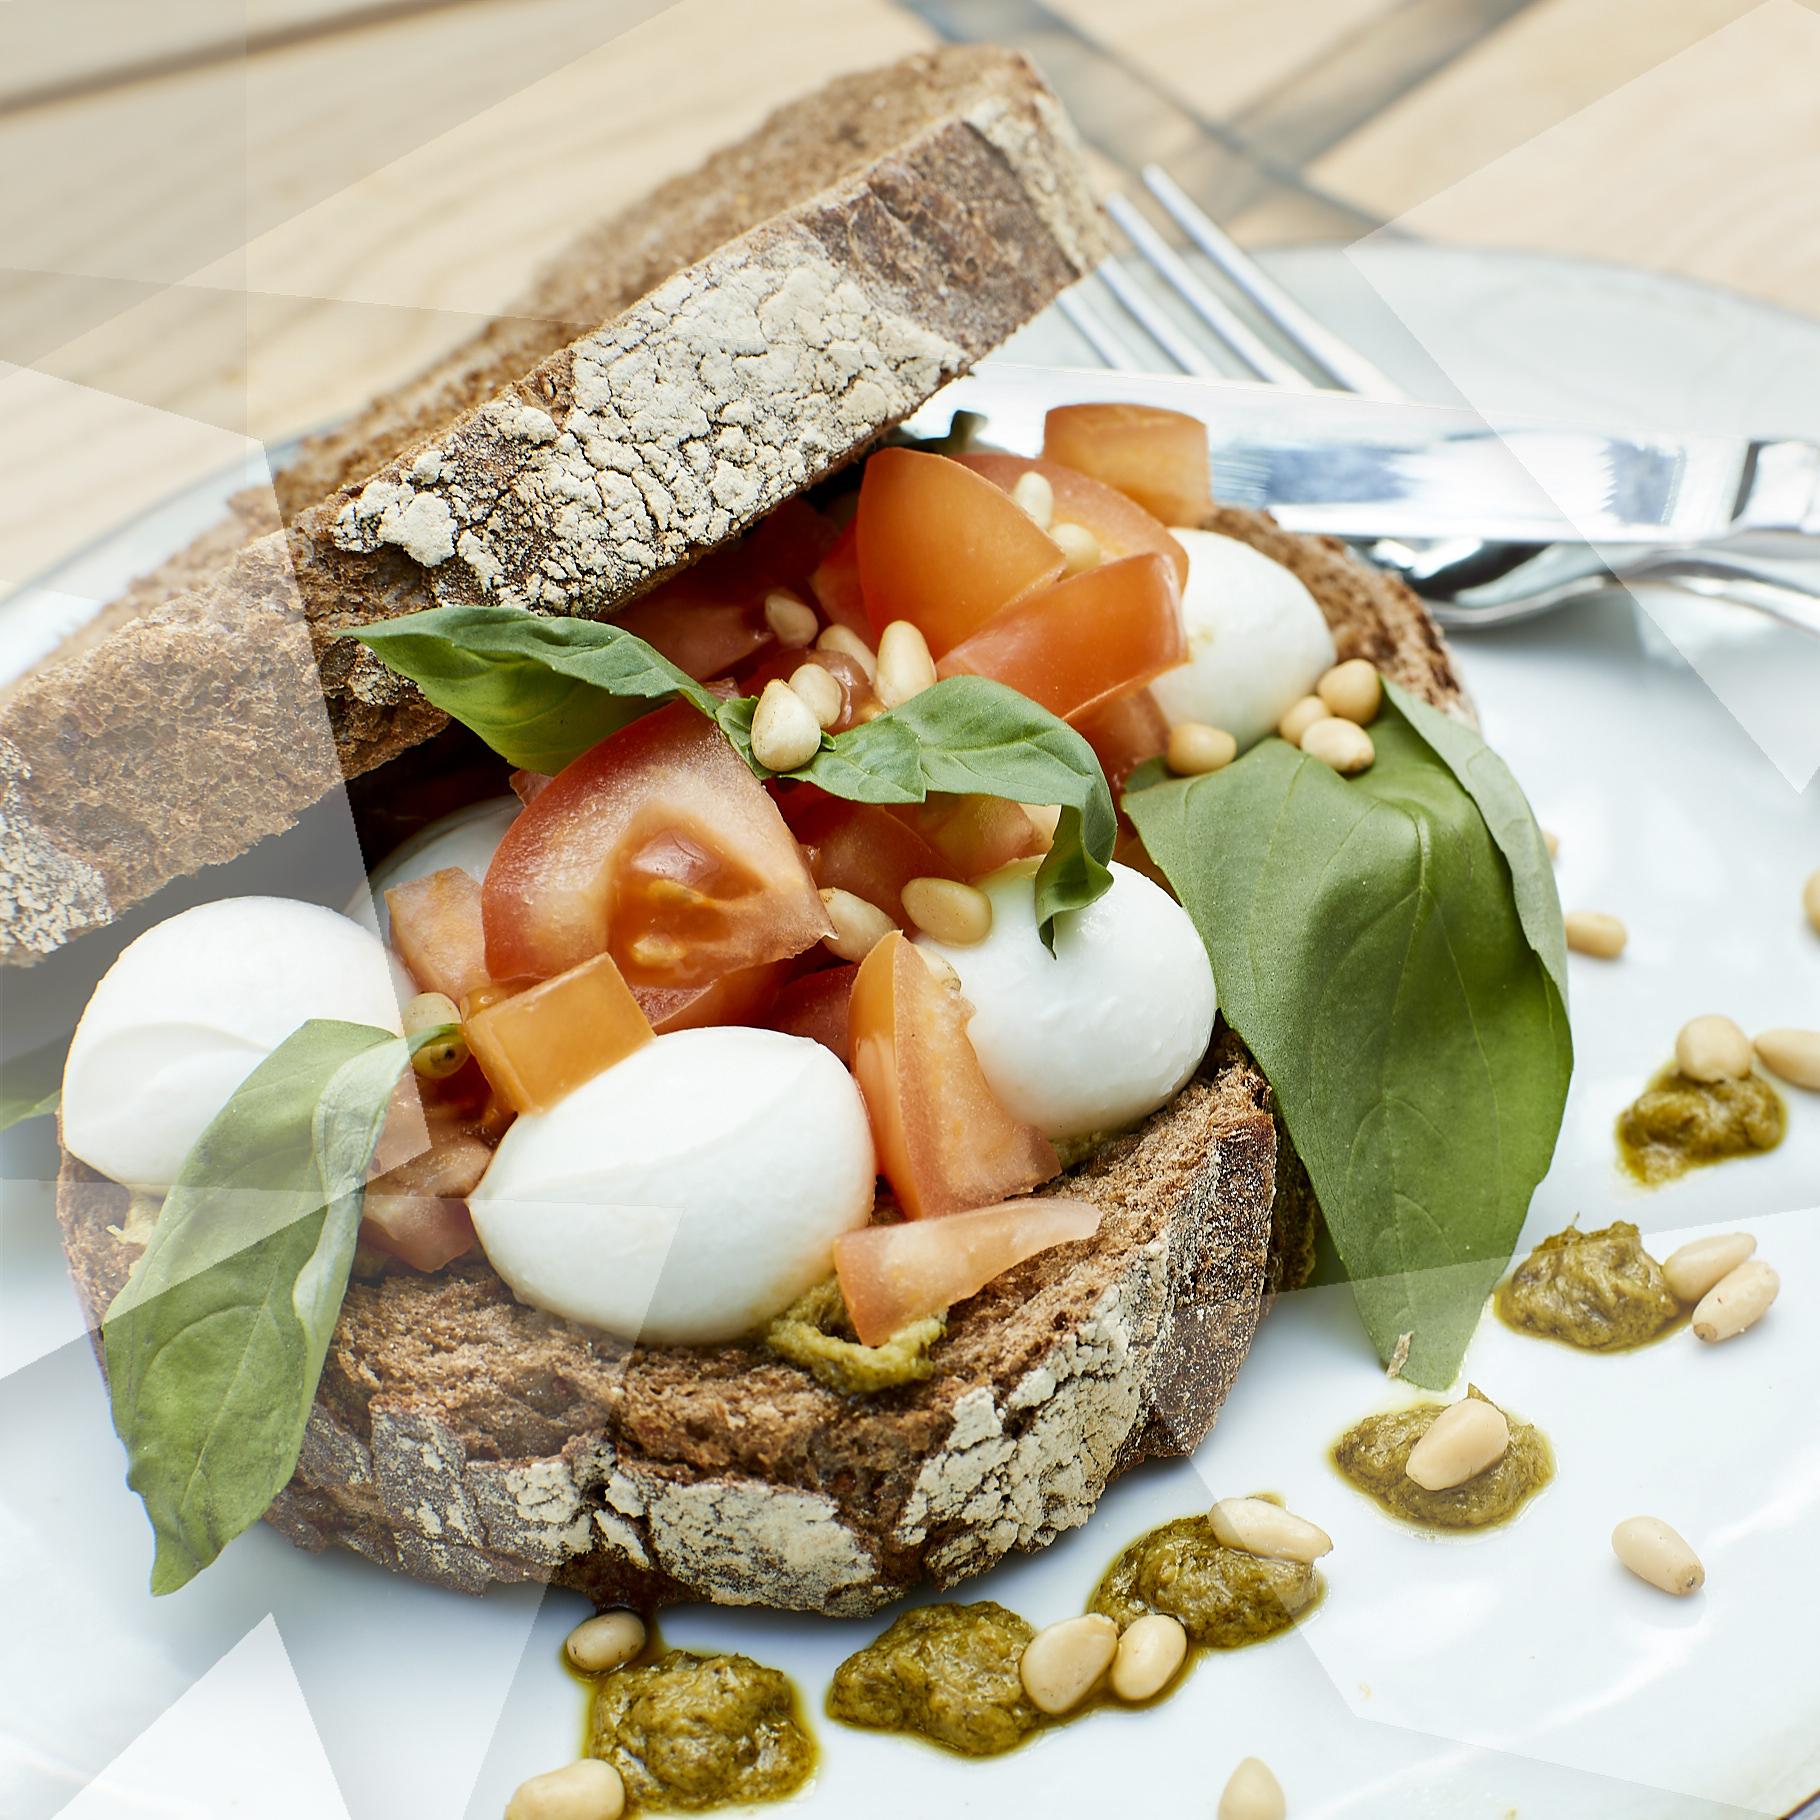 kasteel-de-keverberg-lunch-broodje-mozzarella